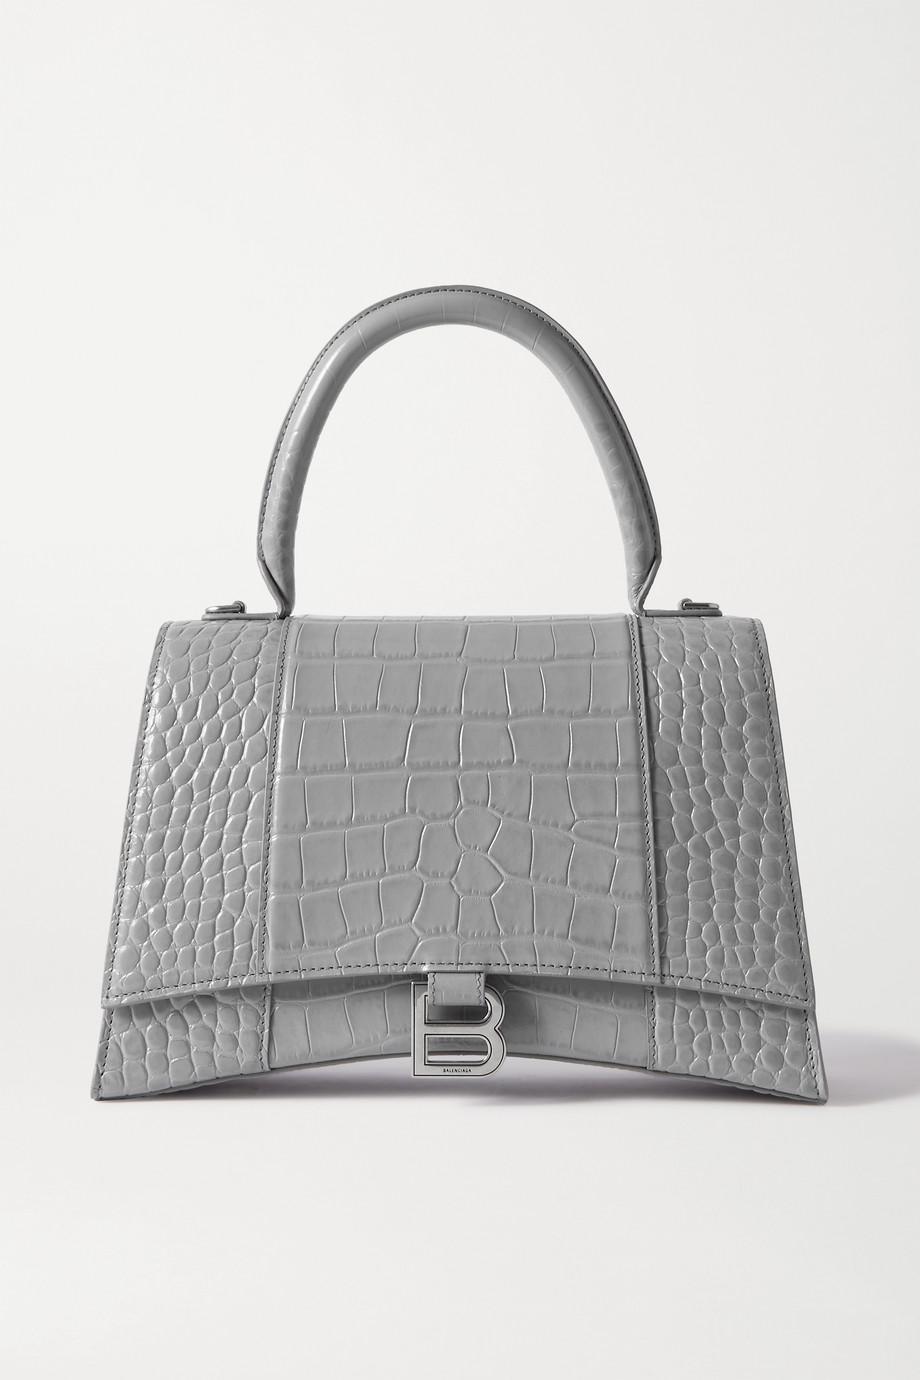 Balenciaga Hourglass medium croc-effect leather tote